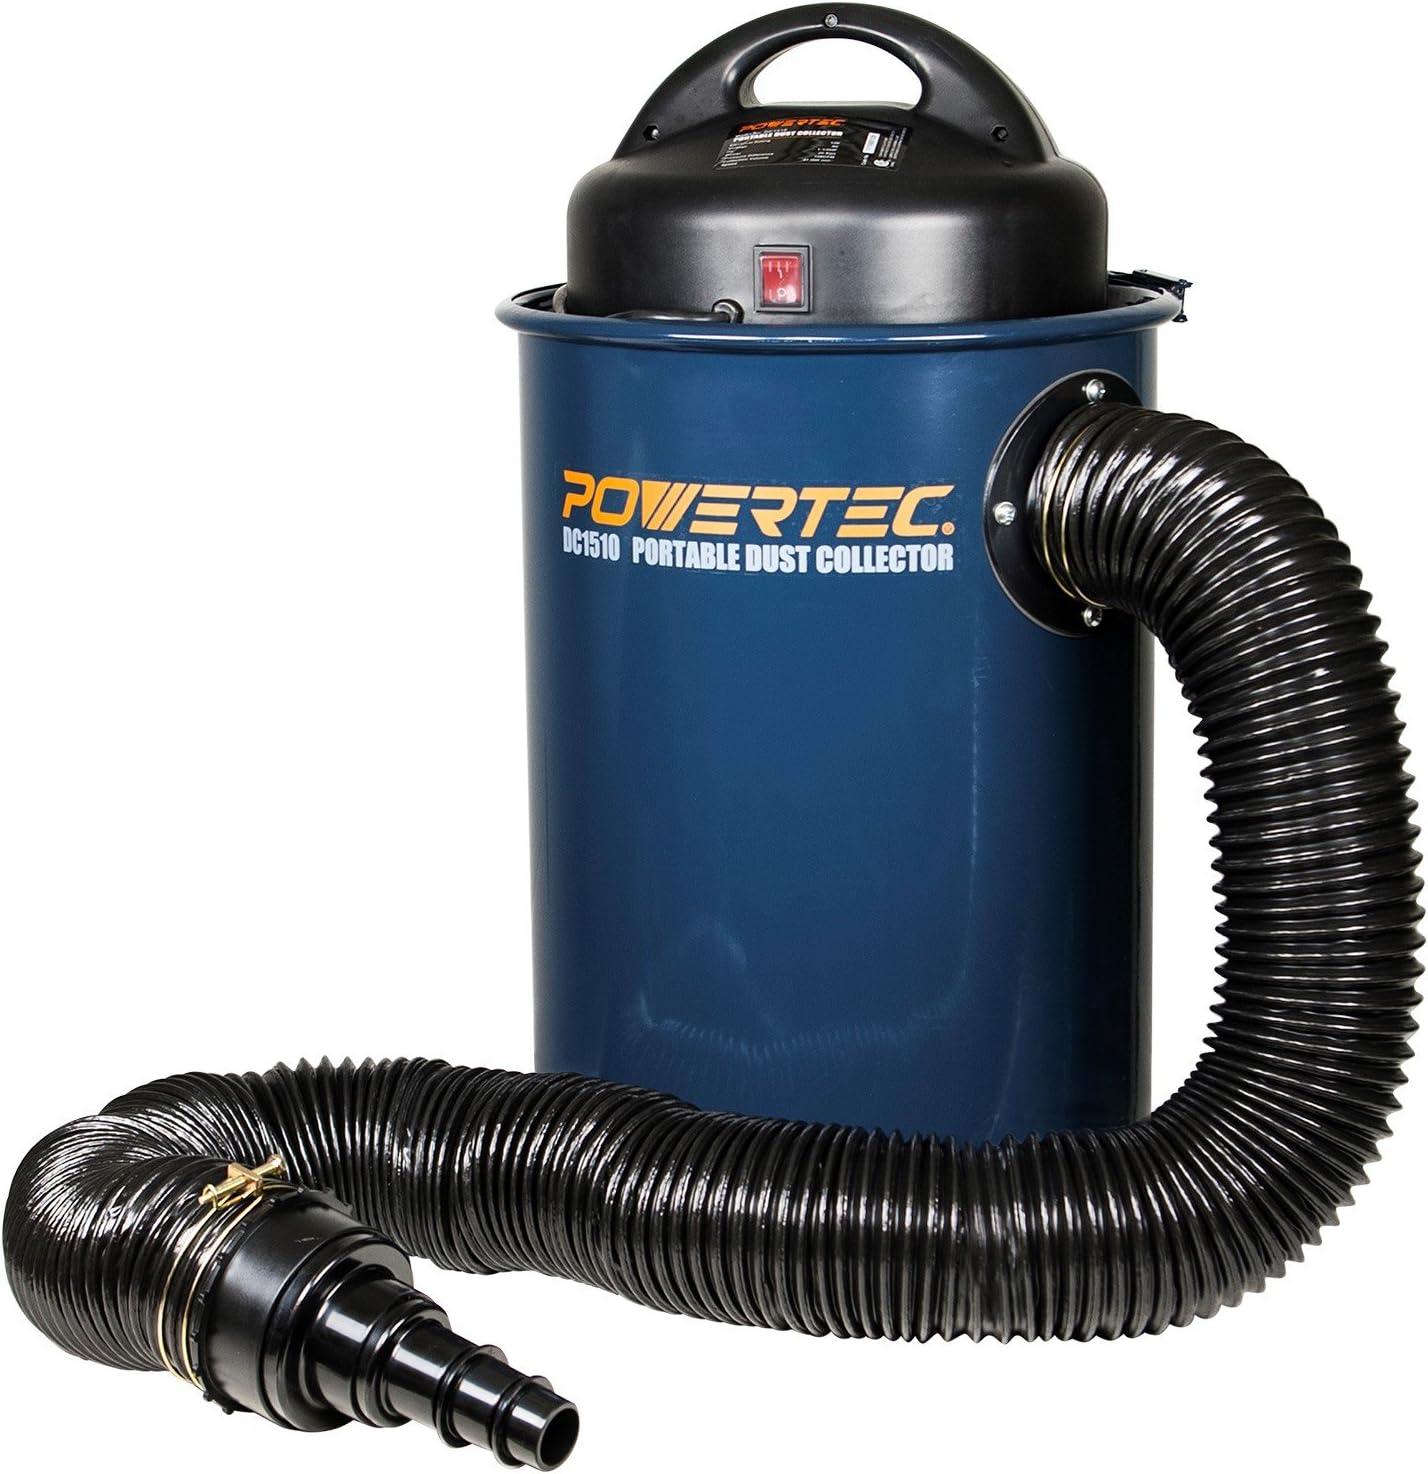 POWERTEC DC1510 1.5-HP Portable Dust Collector Vacuum w/ 13 Gallon Capacity